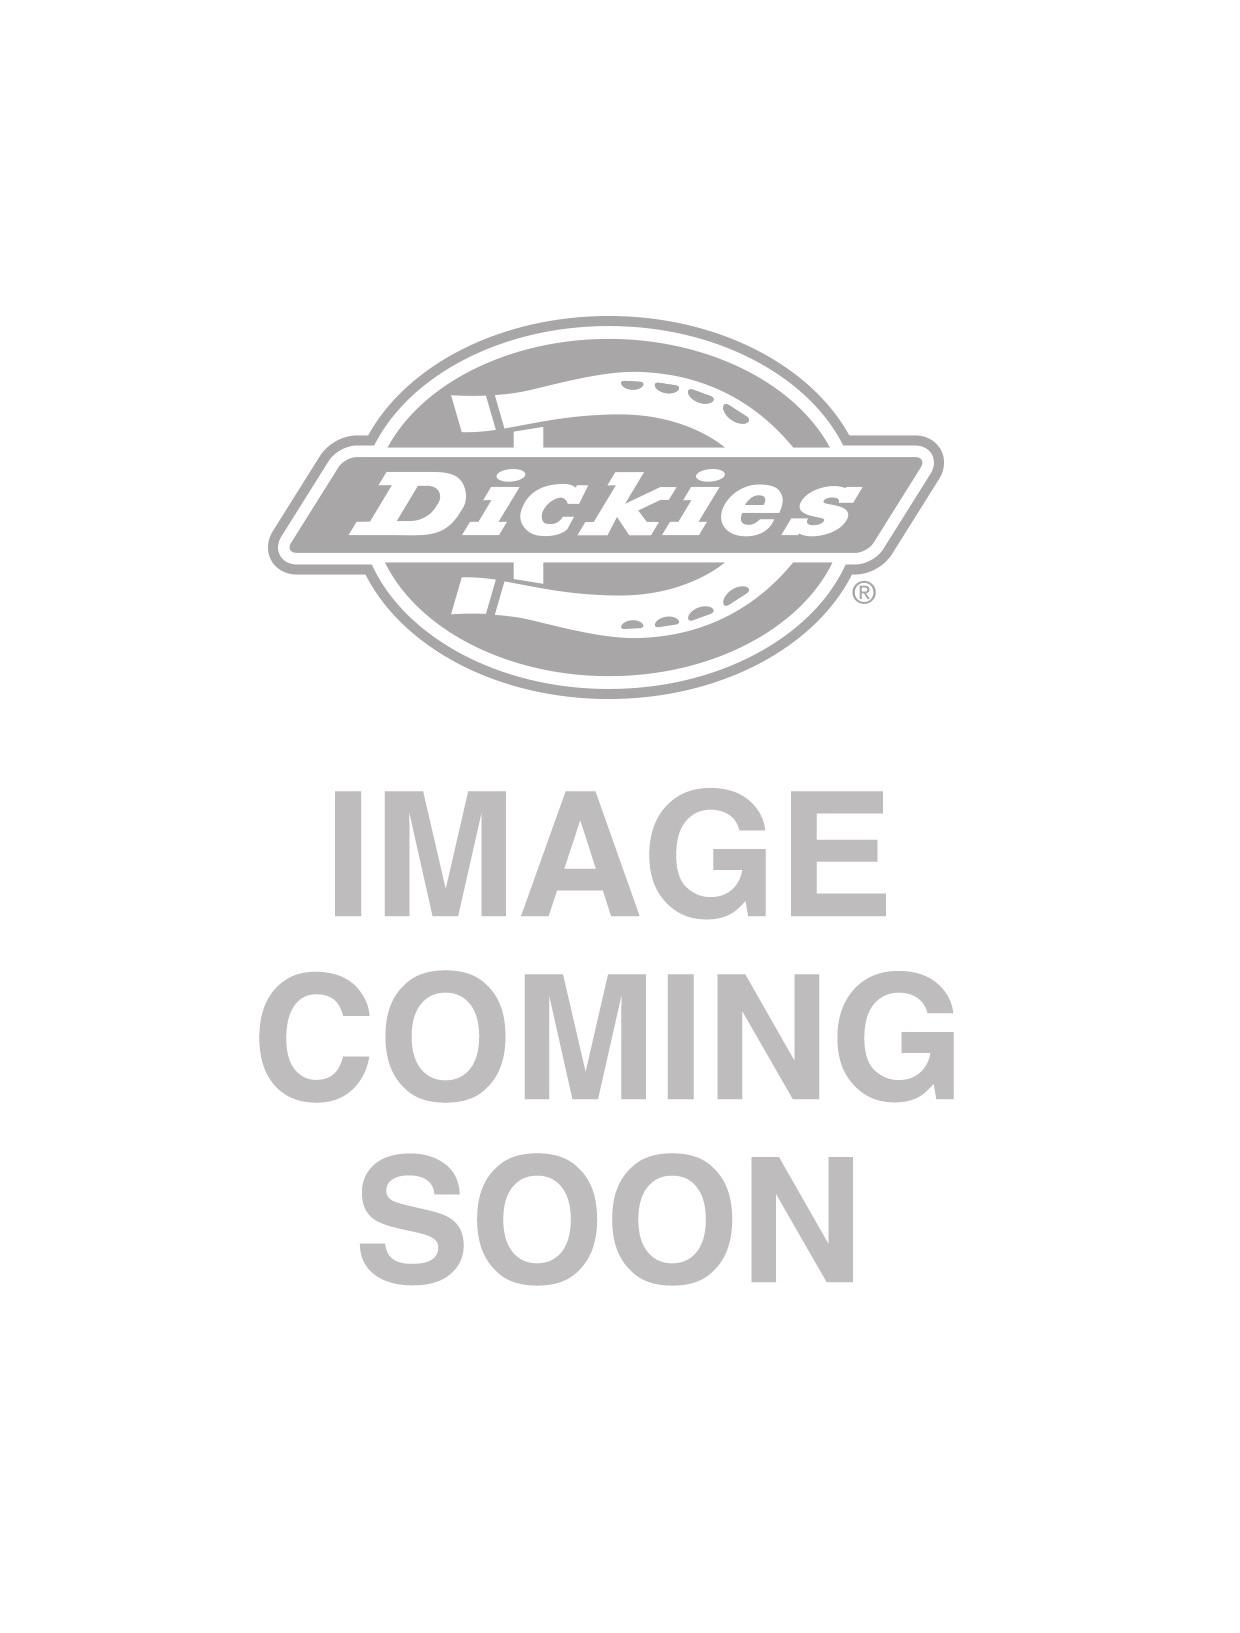 7fdbf82728a612 Dickies Eagle Peak Brogue Boot